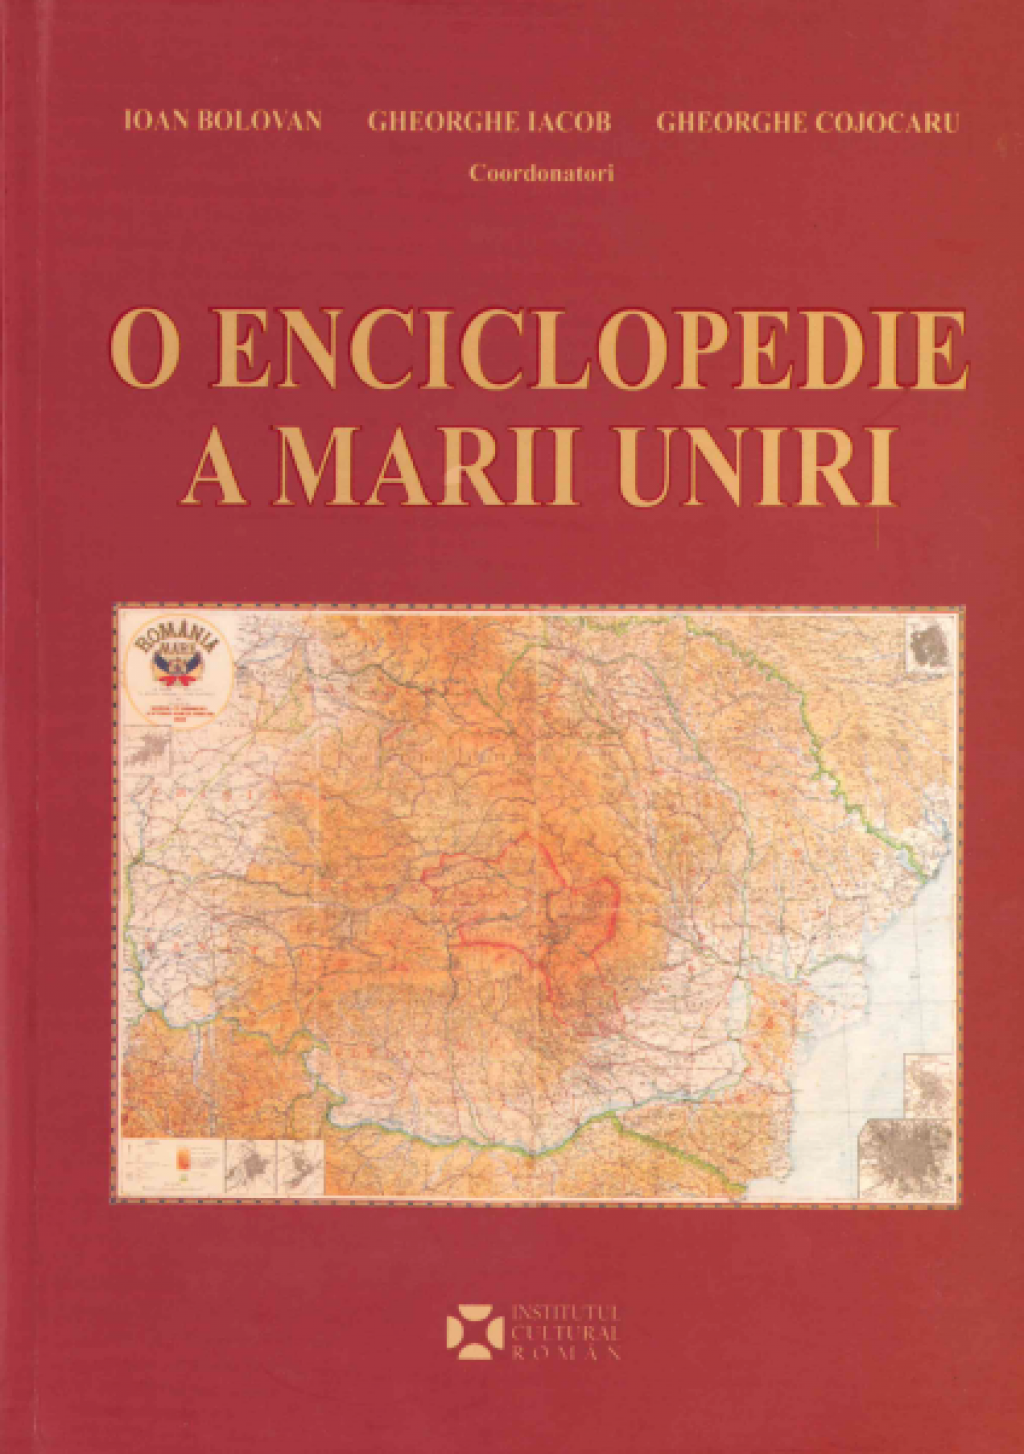 O enciclopedie a Marii Uniri | Ioan Bolovan, Gheorghe Iacob, Gheorghe Cojocaru